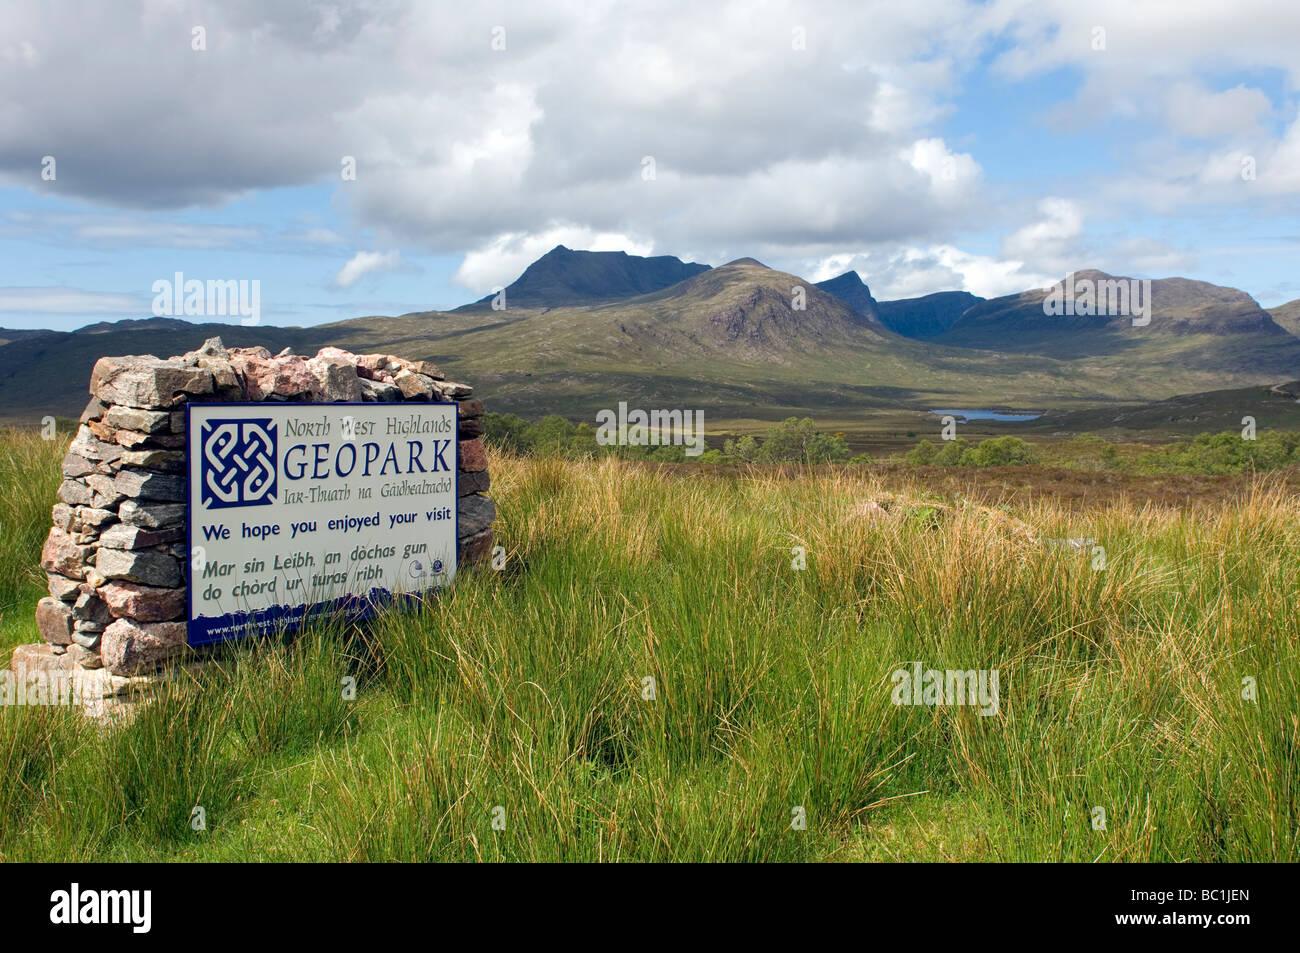 North West Highlands GEOPARK sign, Coigach, Highland Region, Scotland - Stock Image